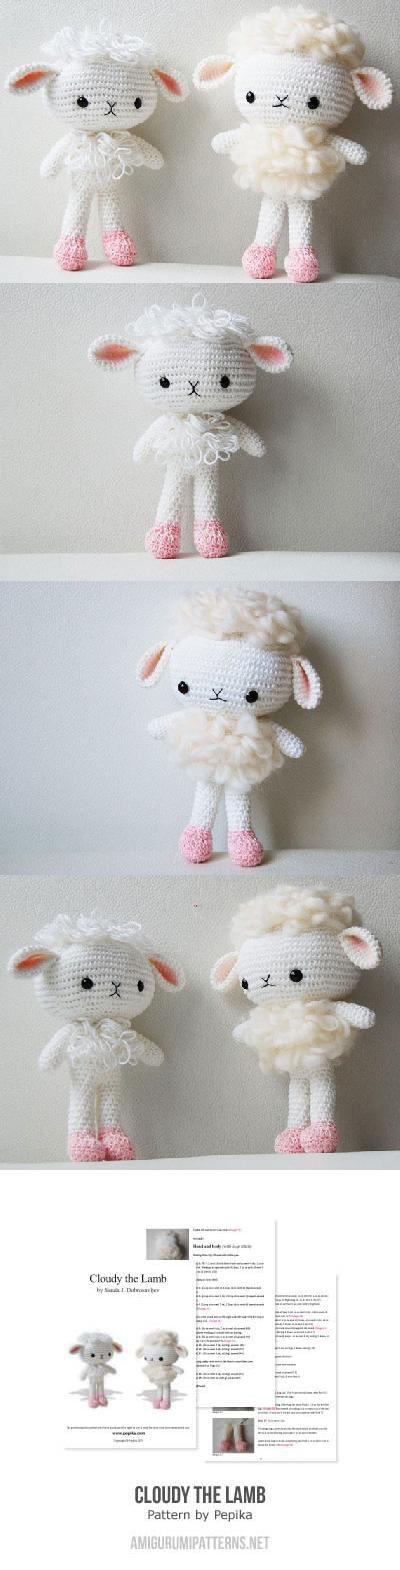 Cloudy the Lamb amigurumi pattern by Pepika | Patrones amigurumi ...